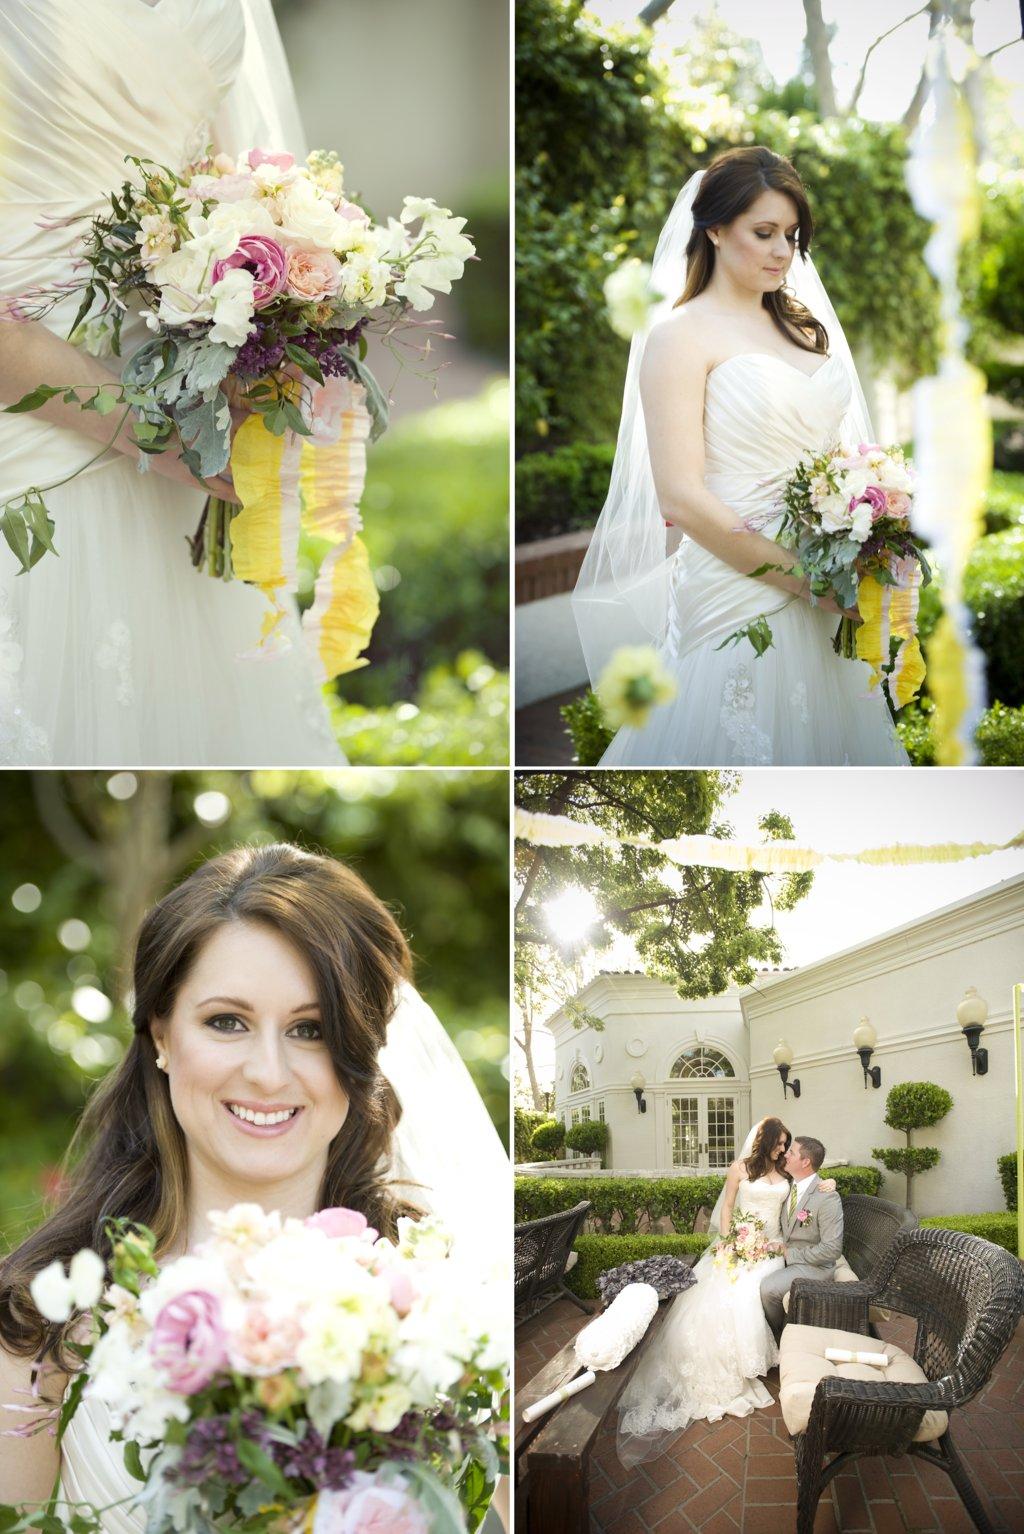 Whimsical-garden-wedding-romantic-bridal-bouquet-outdoor-wedding-details.full